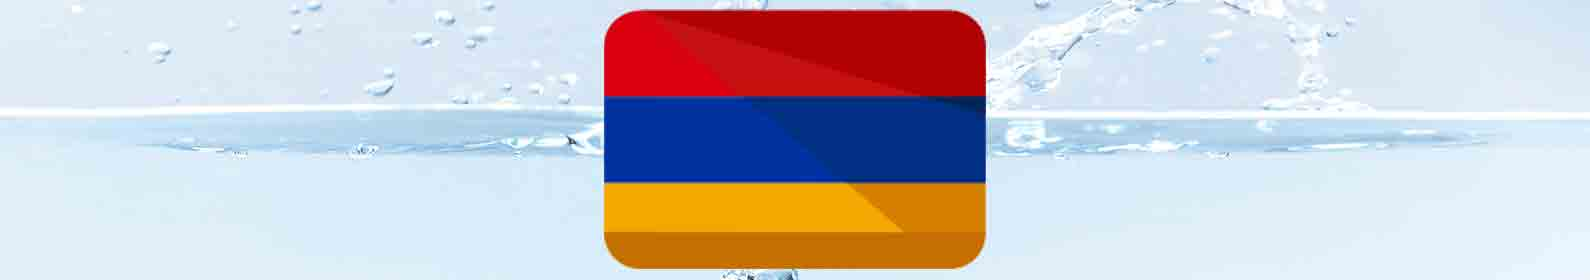 water-treatment-armenia.jpg